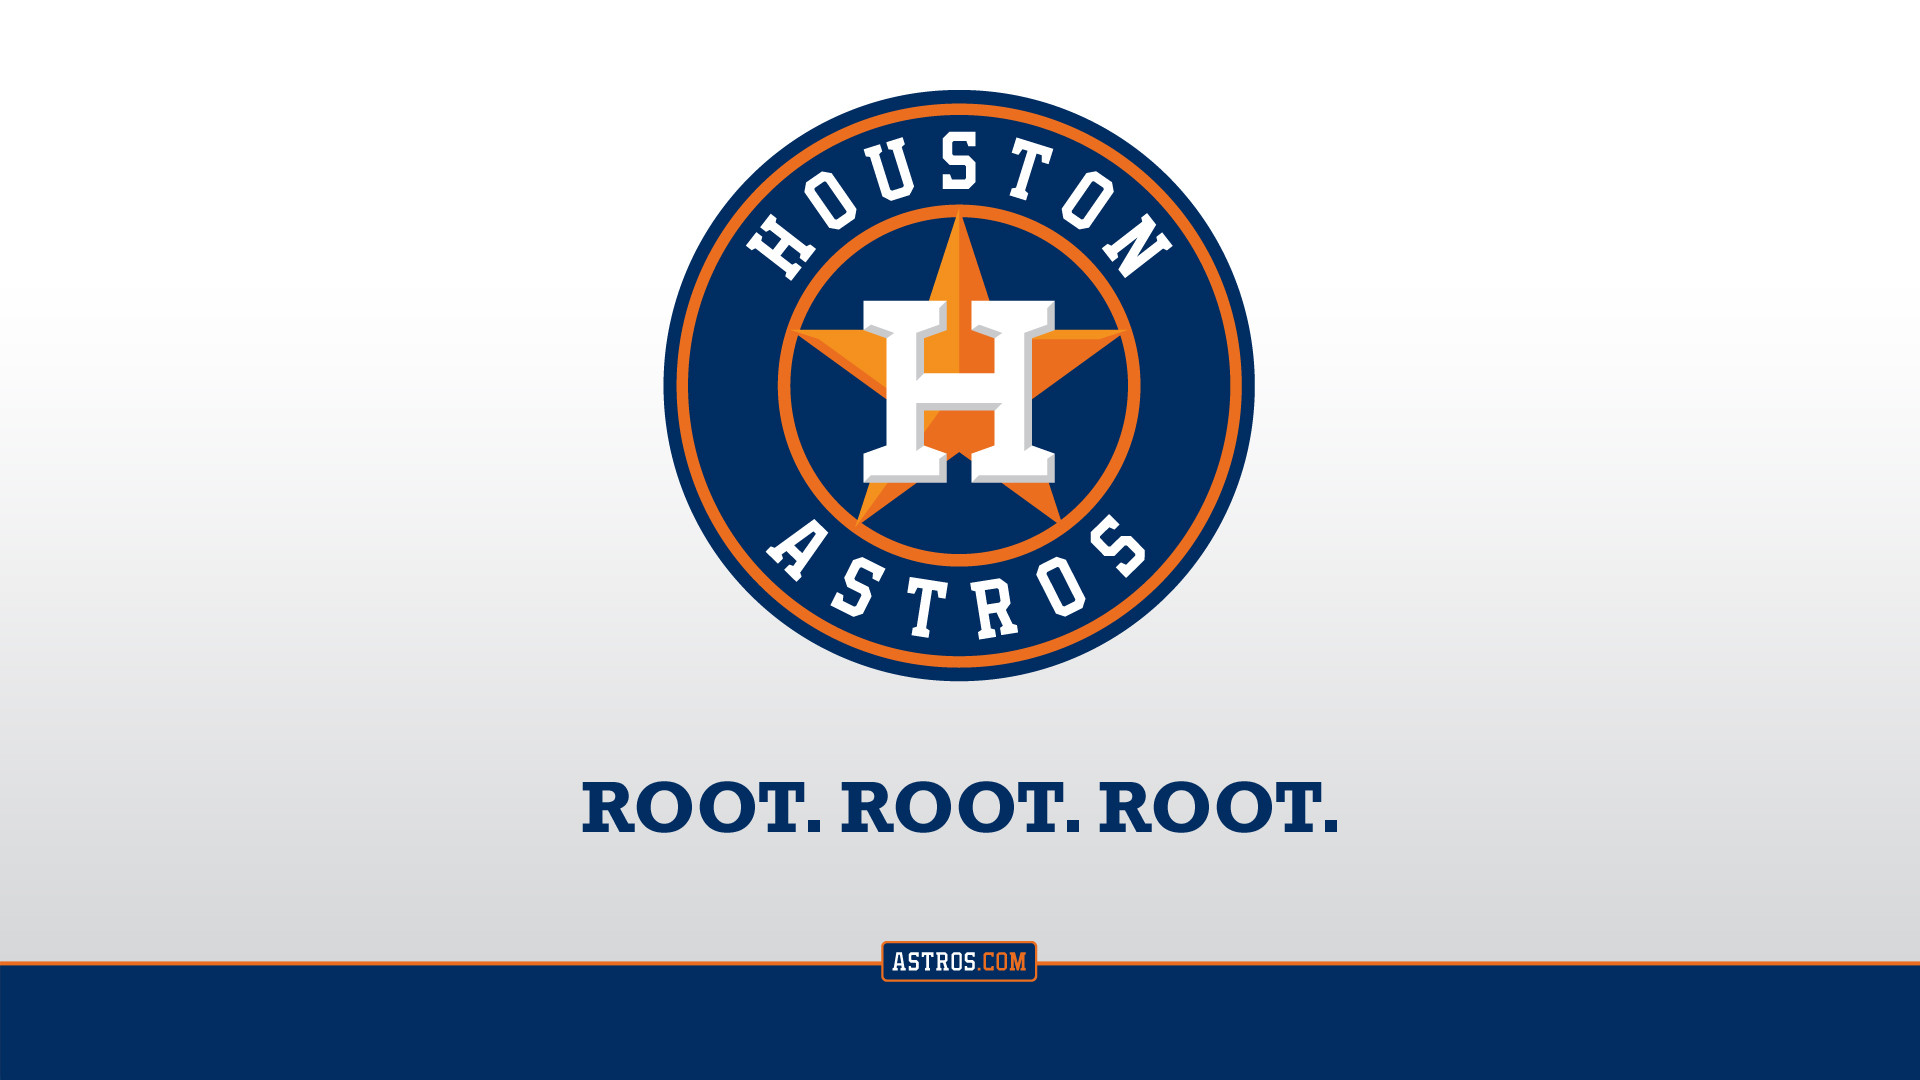 Houston Astros Wallpaper – Desktop, Phone, Tablet   Houston Astros